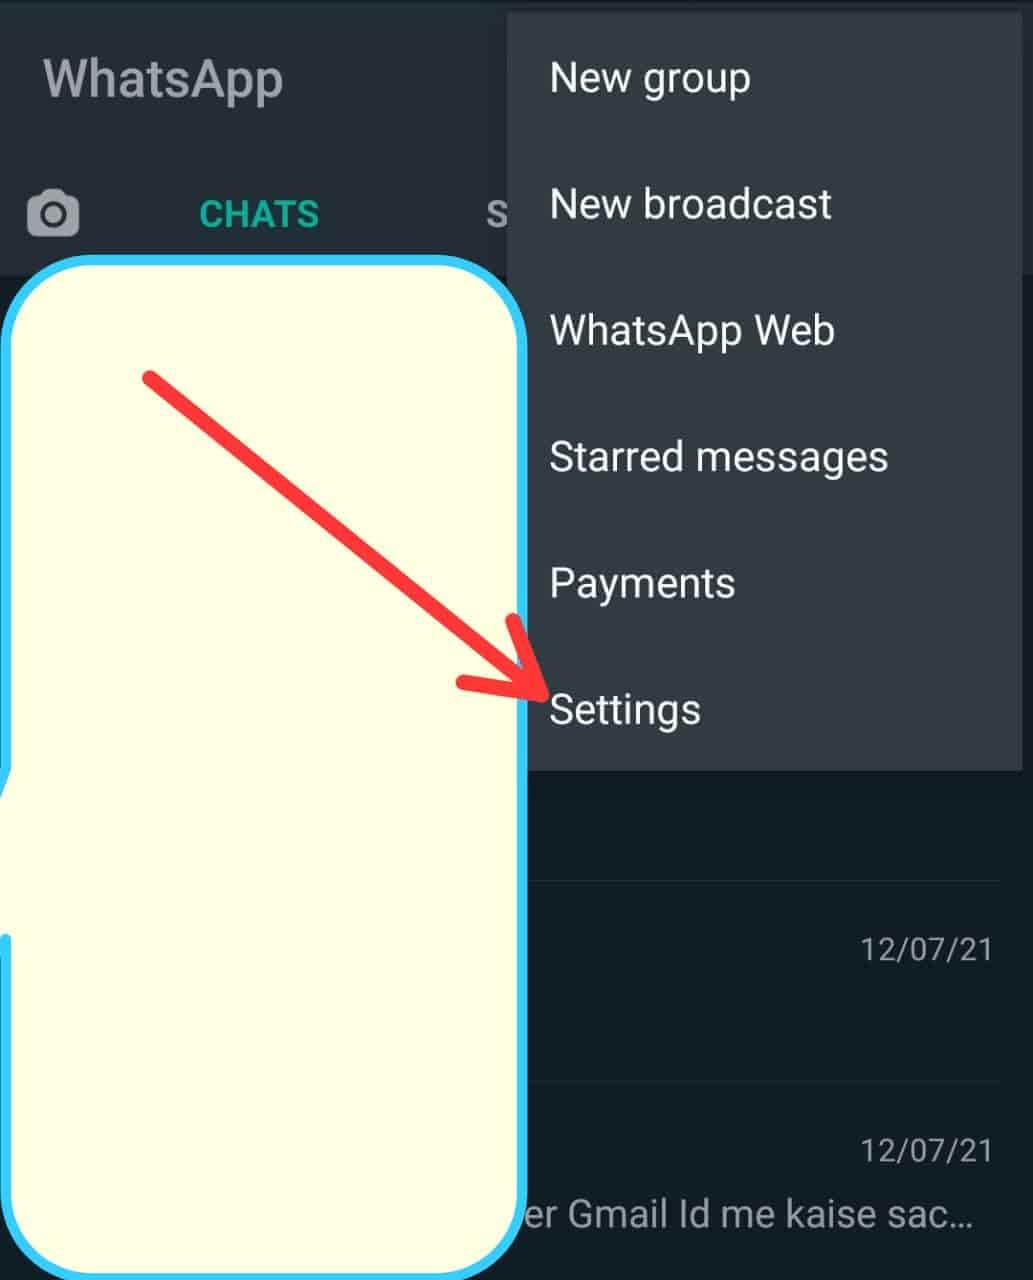 Whatsapp Notification On/Off कैसे करें Whatsapp Notification Setting Whatsapp Notification Hide कैसे करें Whatsapp Notification क्या हैं Whatsapp Notification Off कैसे करें